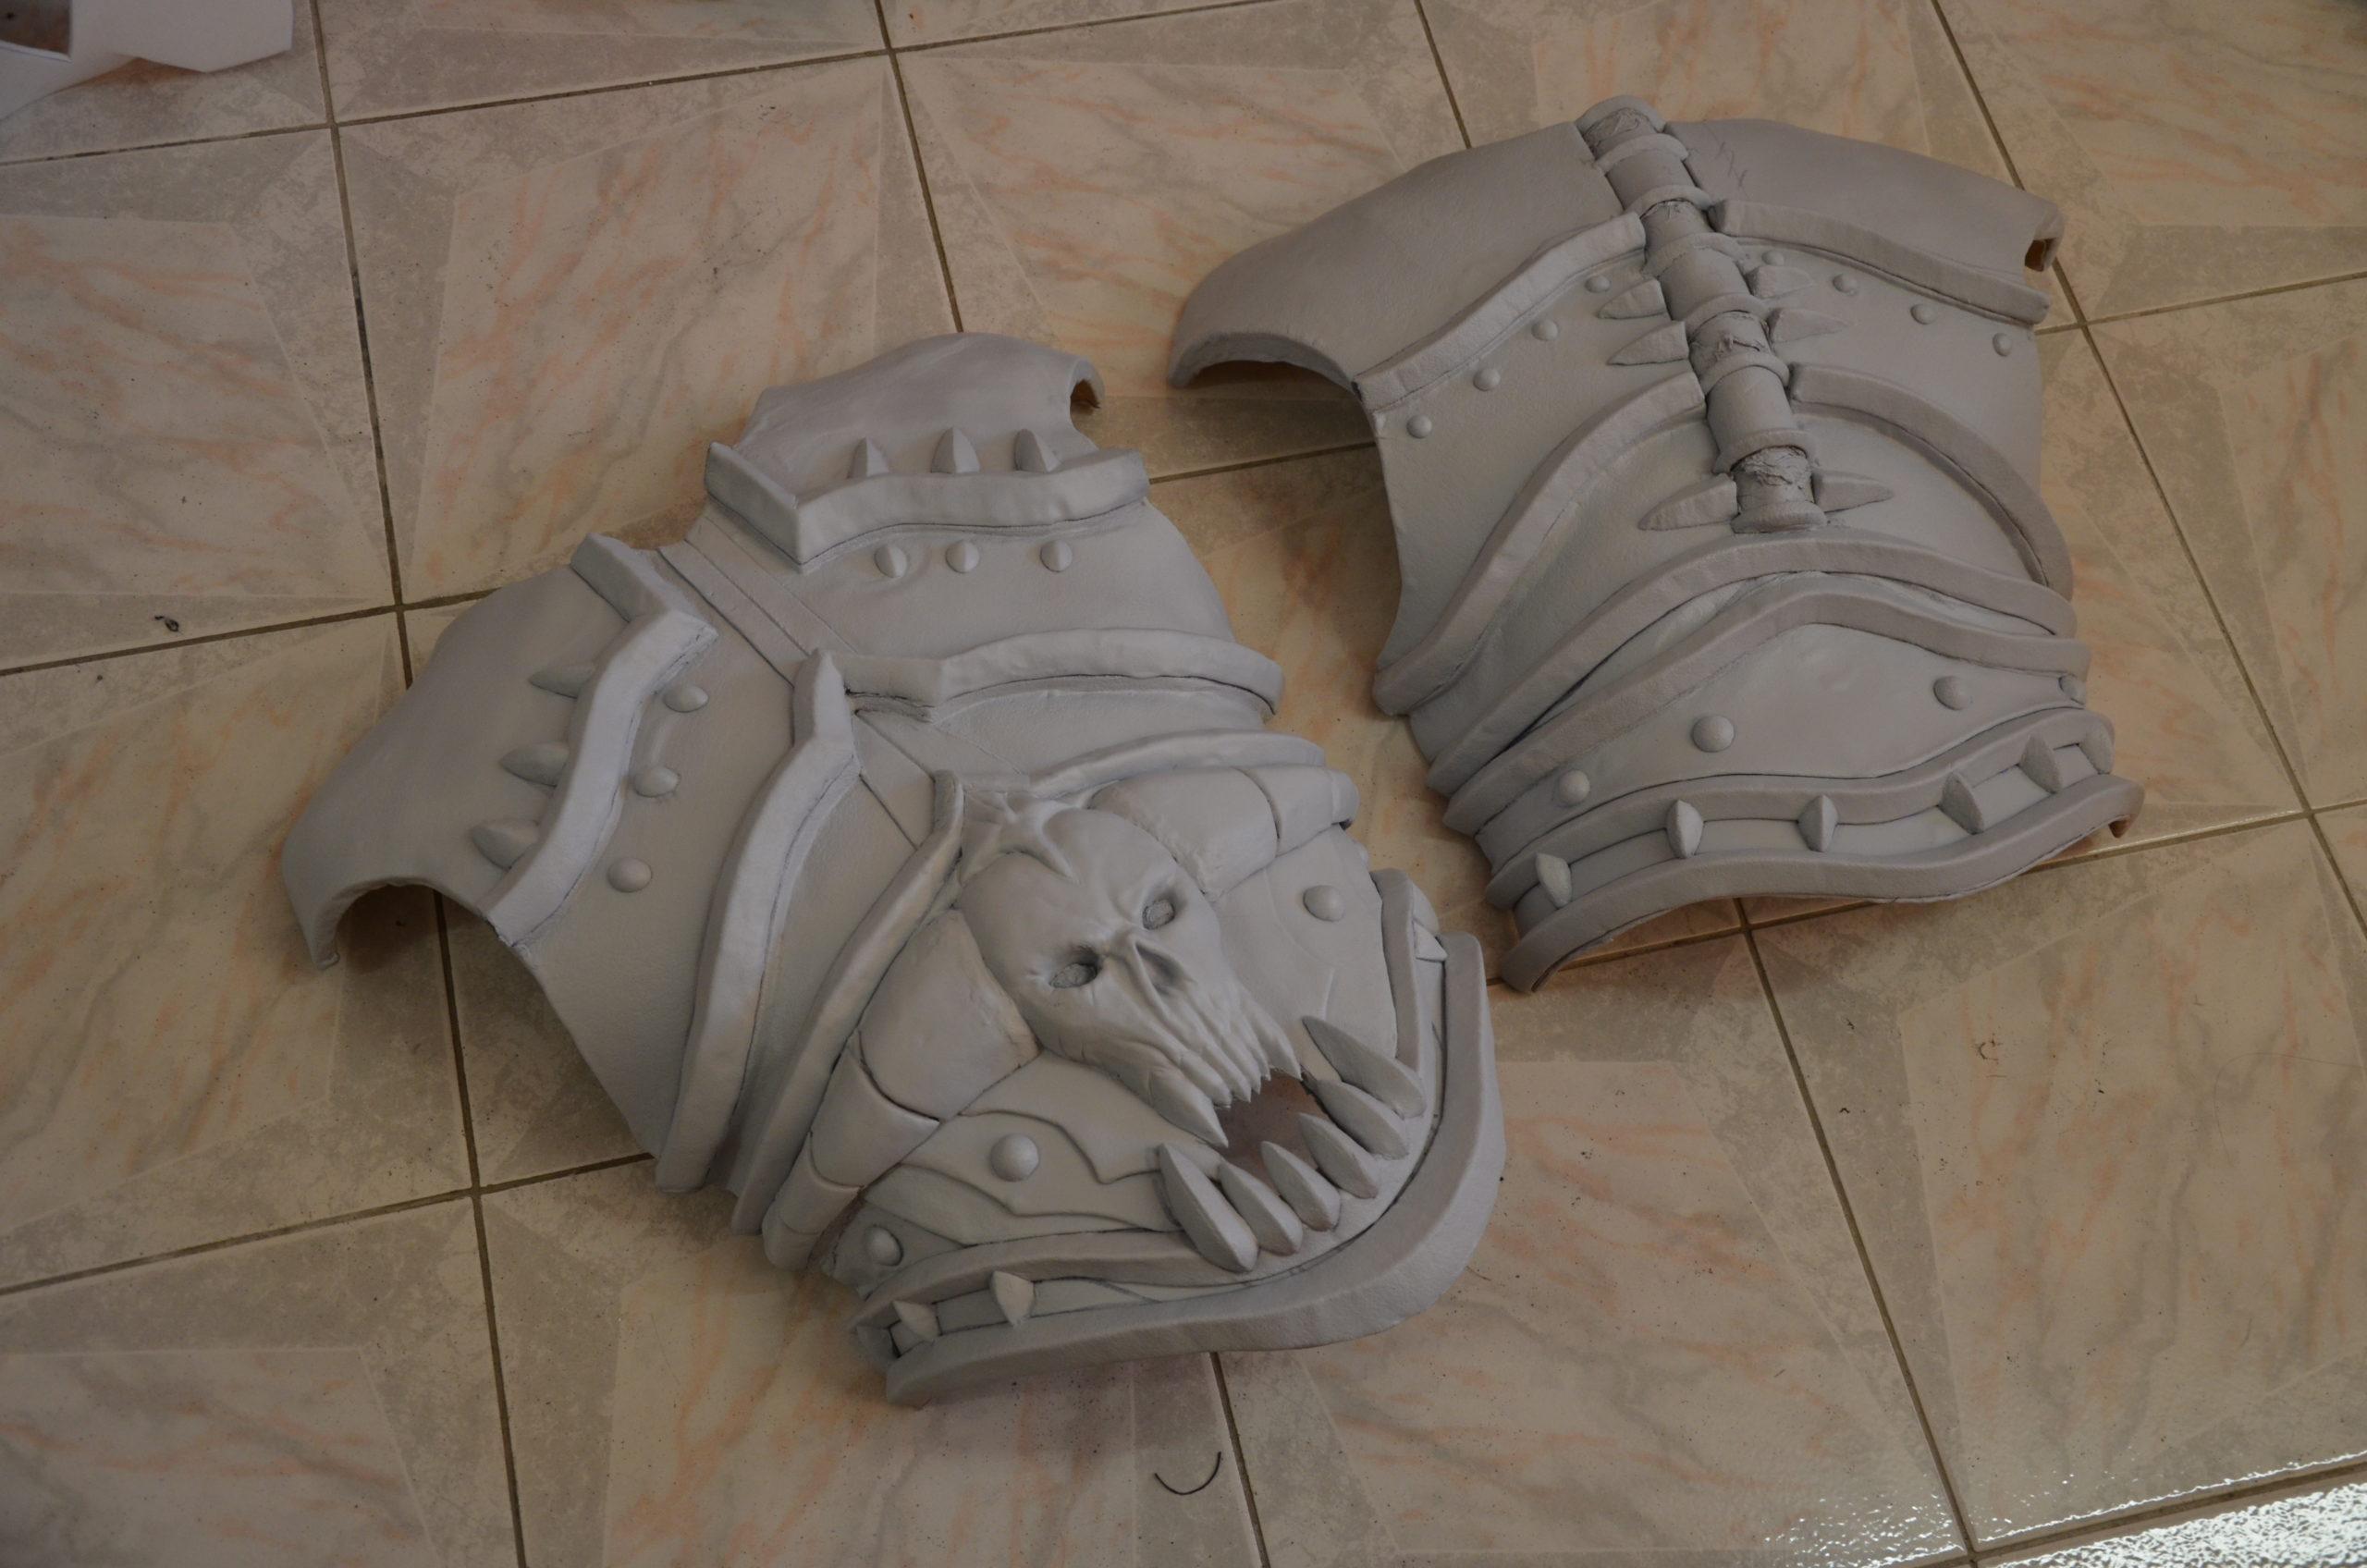 appret worbla armure